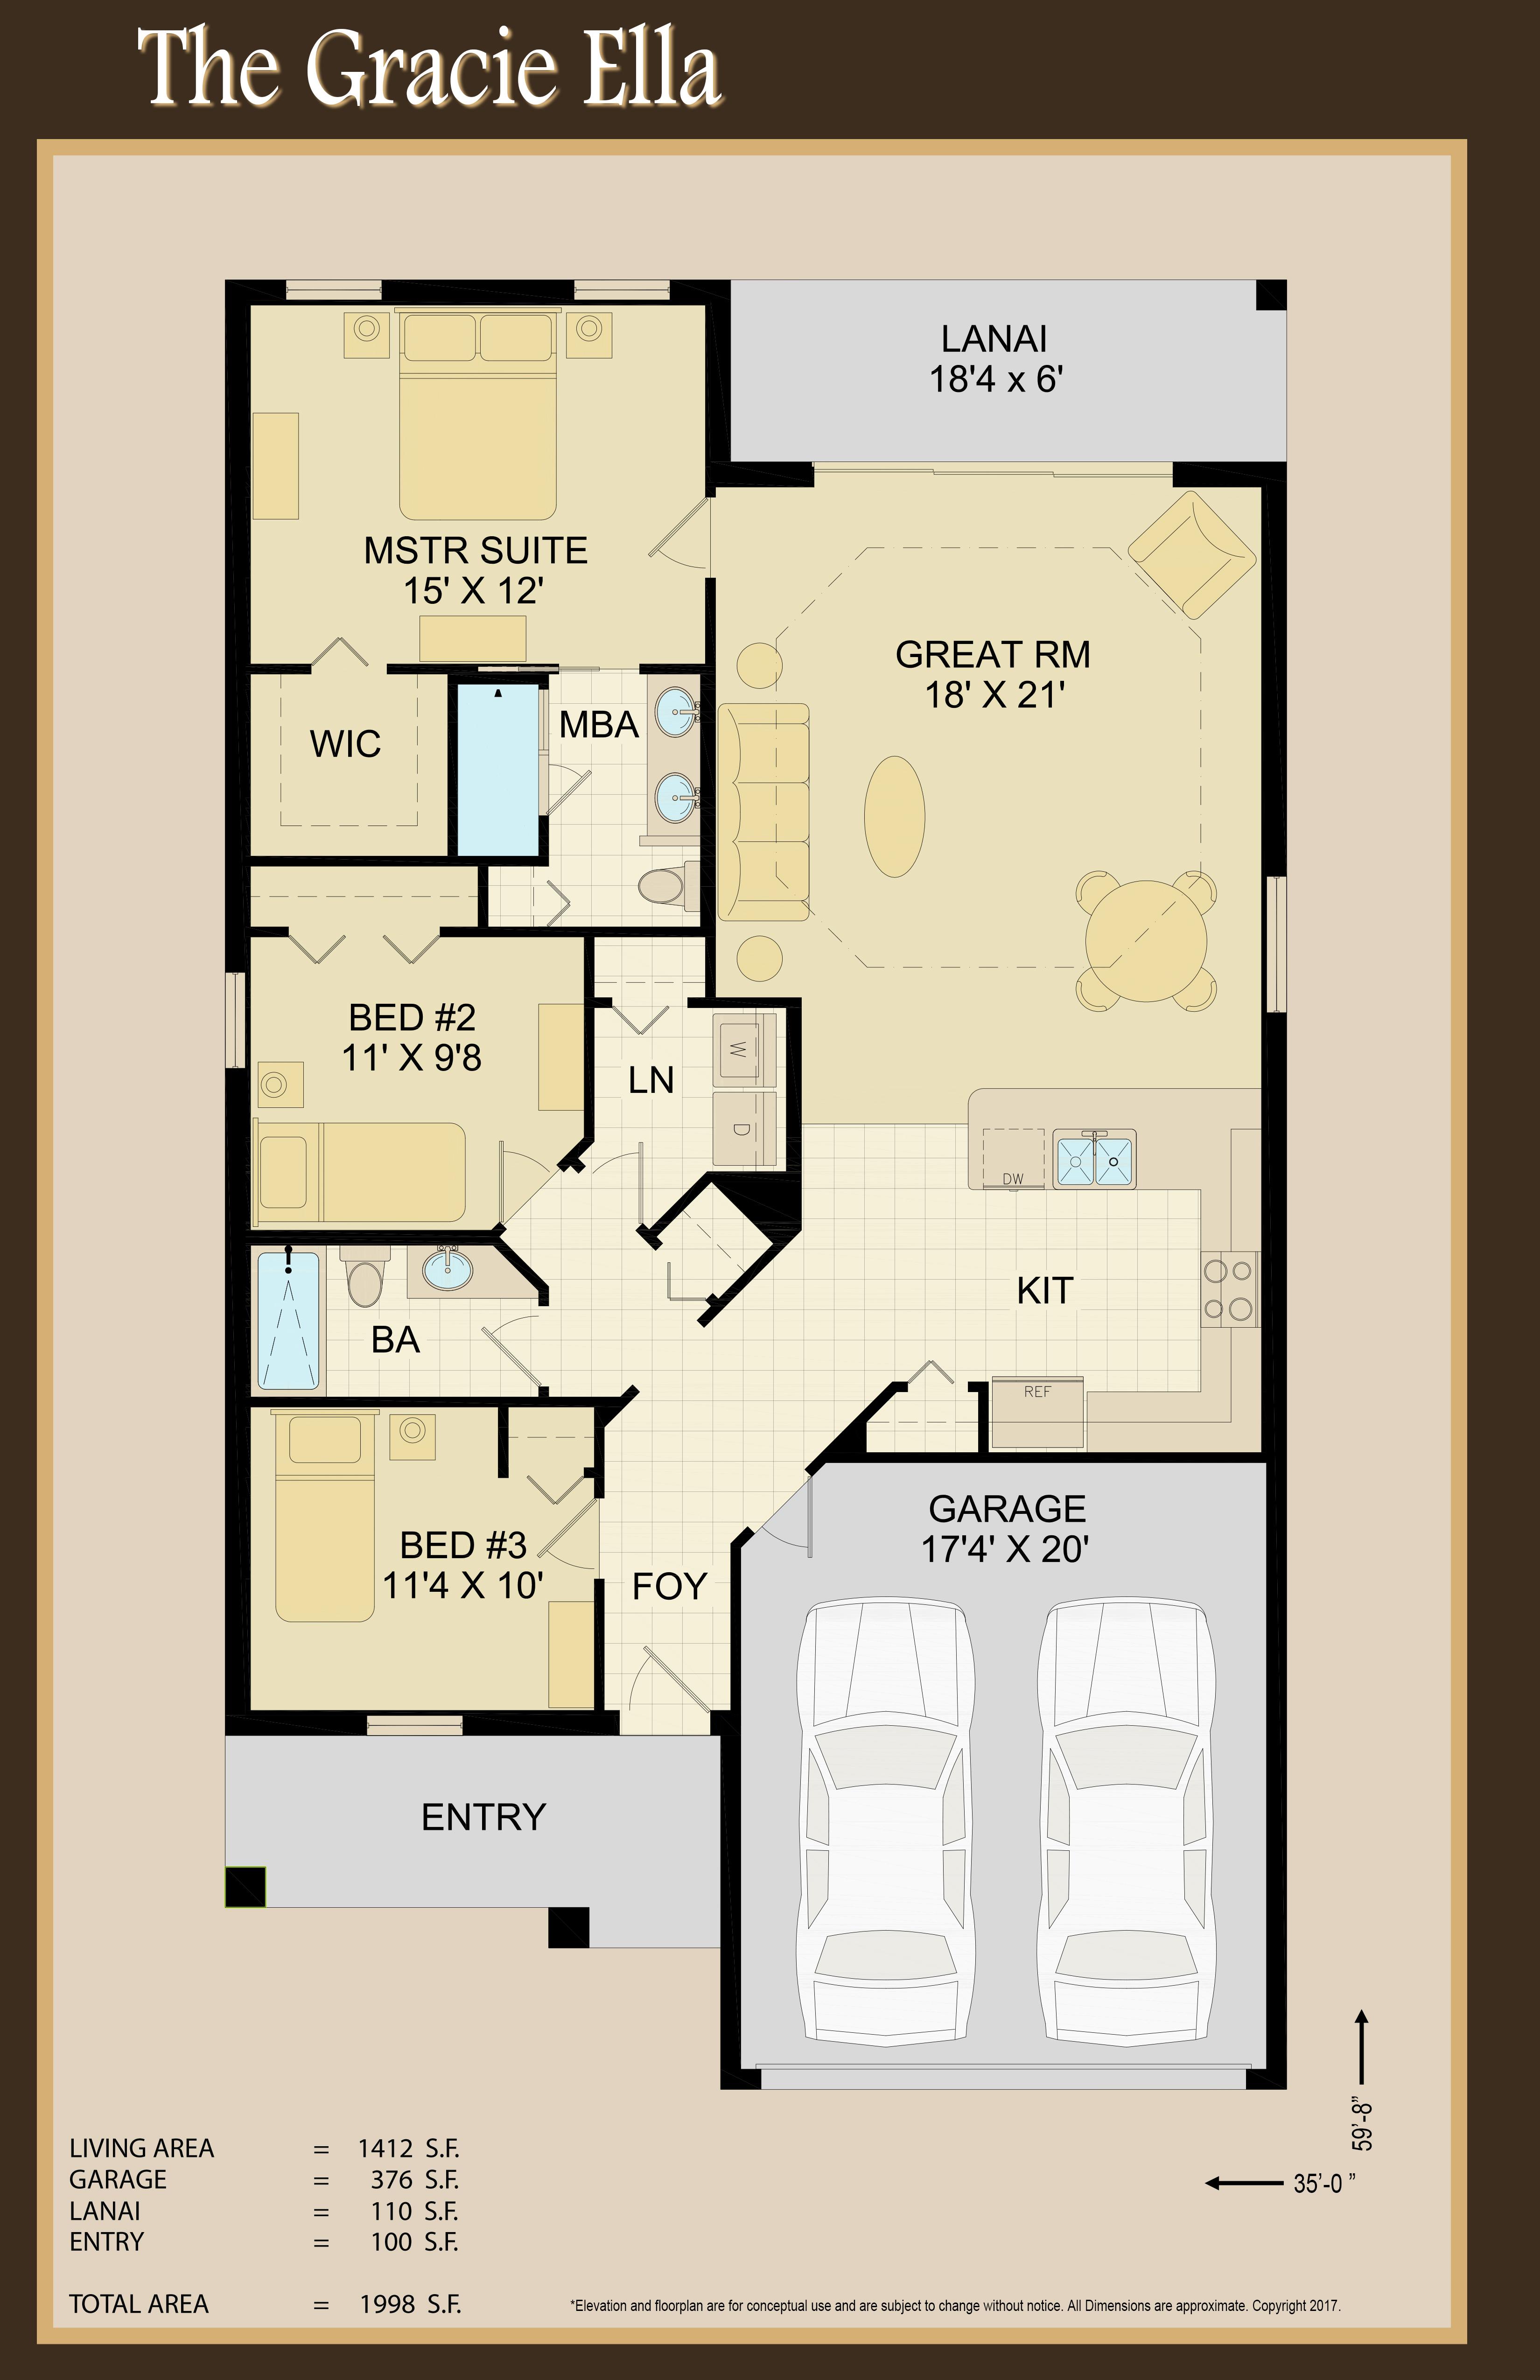 Gracie Ella Floor Plan | Home Model Floor Plan